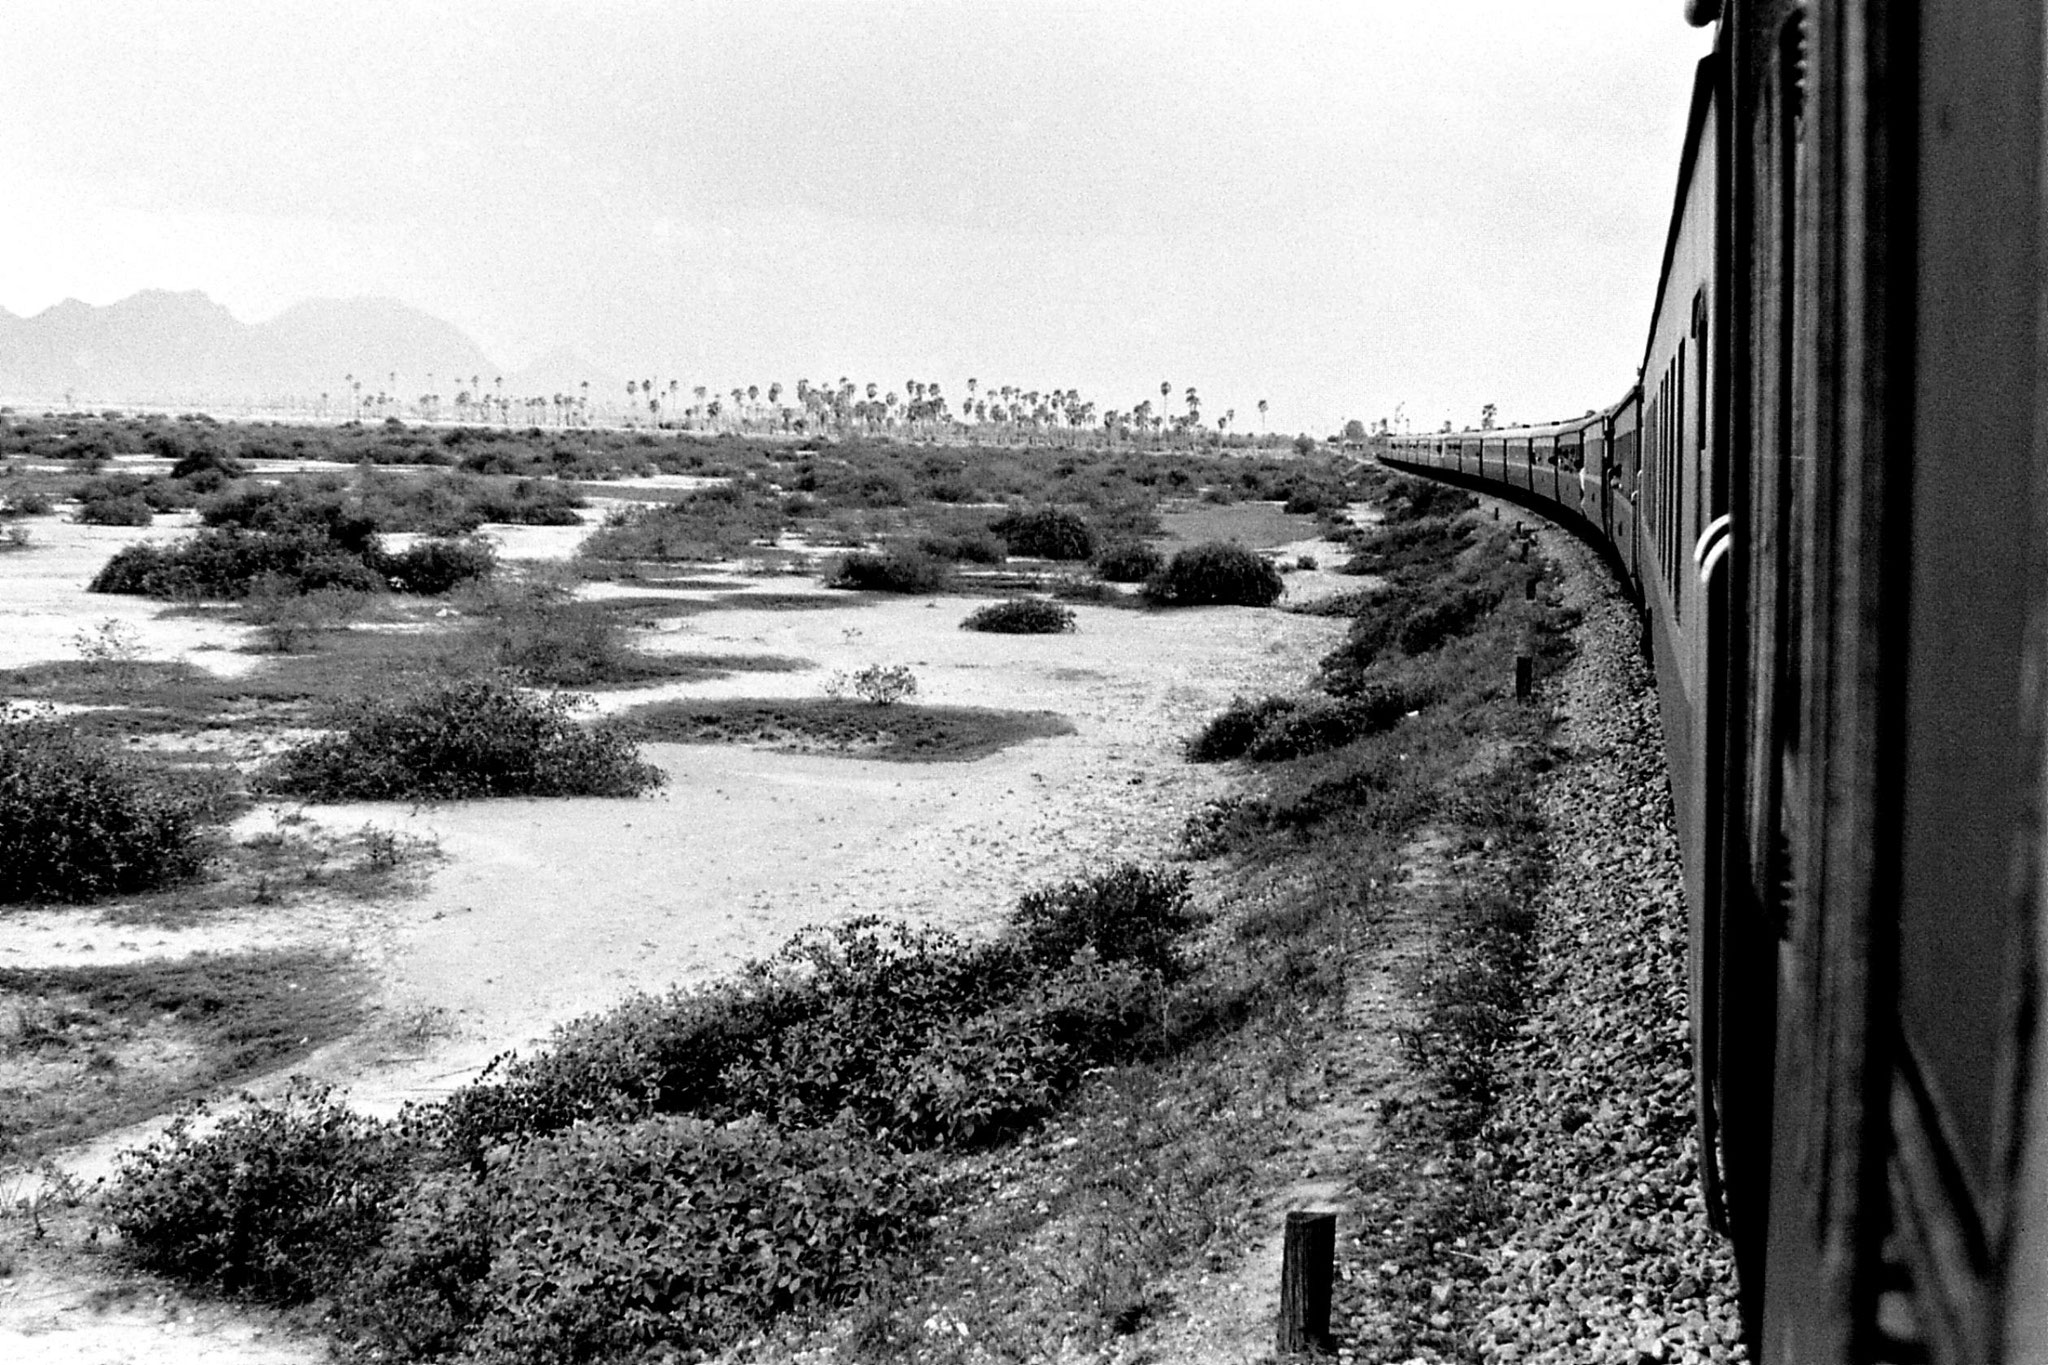 18/6/1990: 29: our train Bangkok to Malaysia, talipot palms